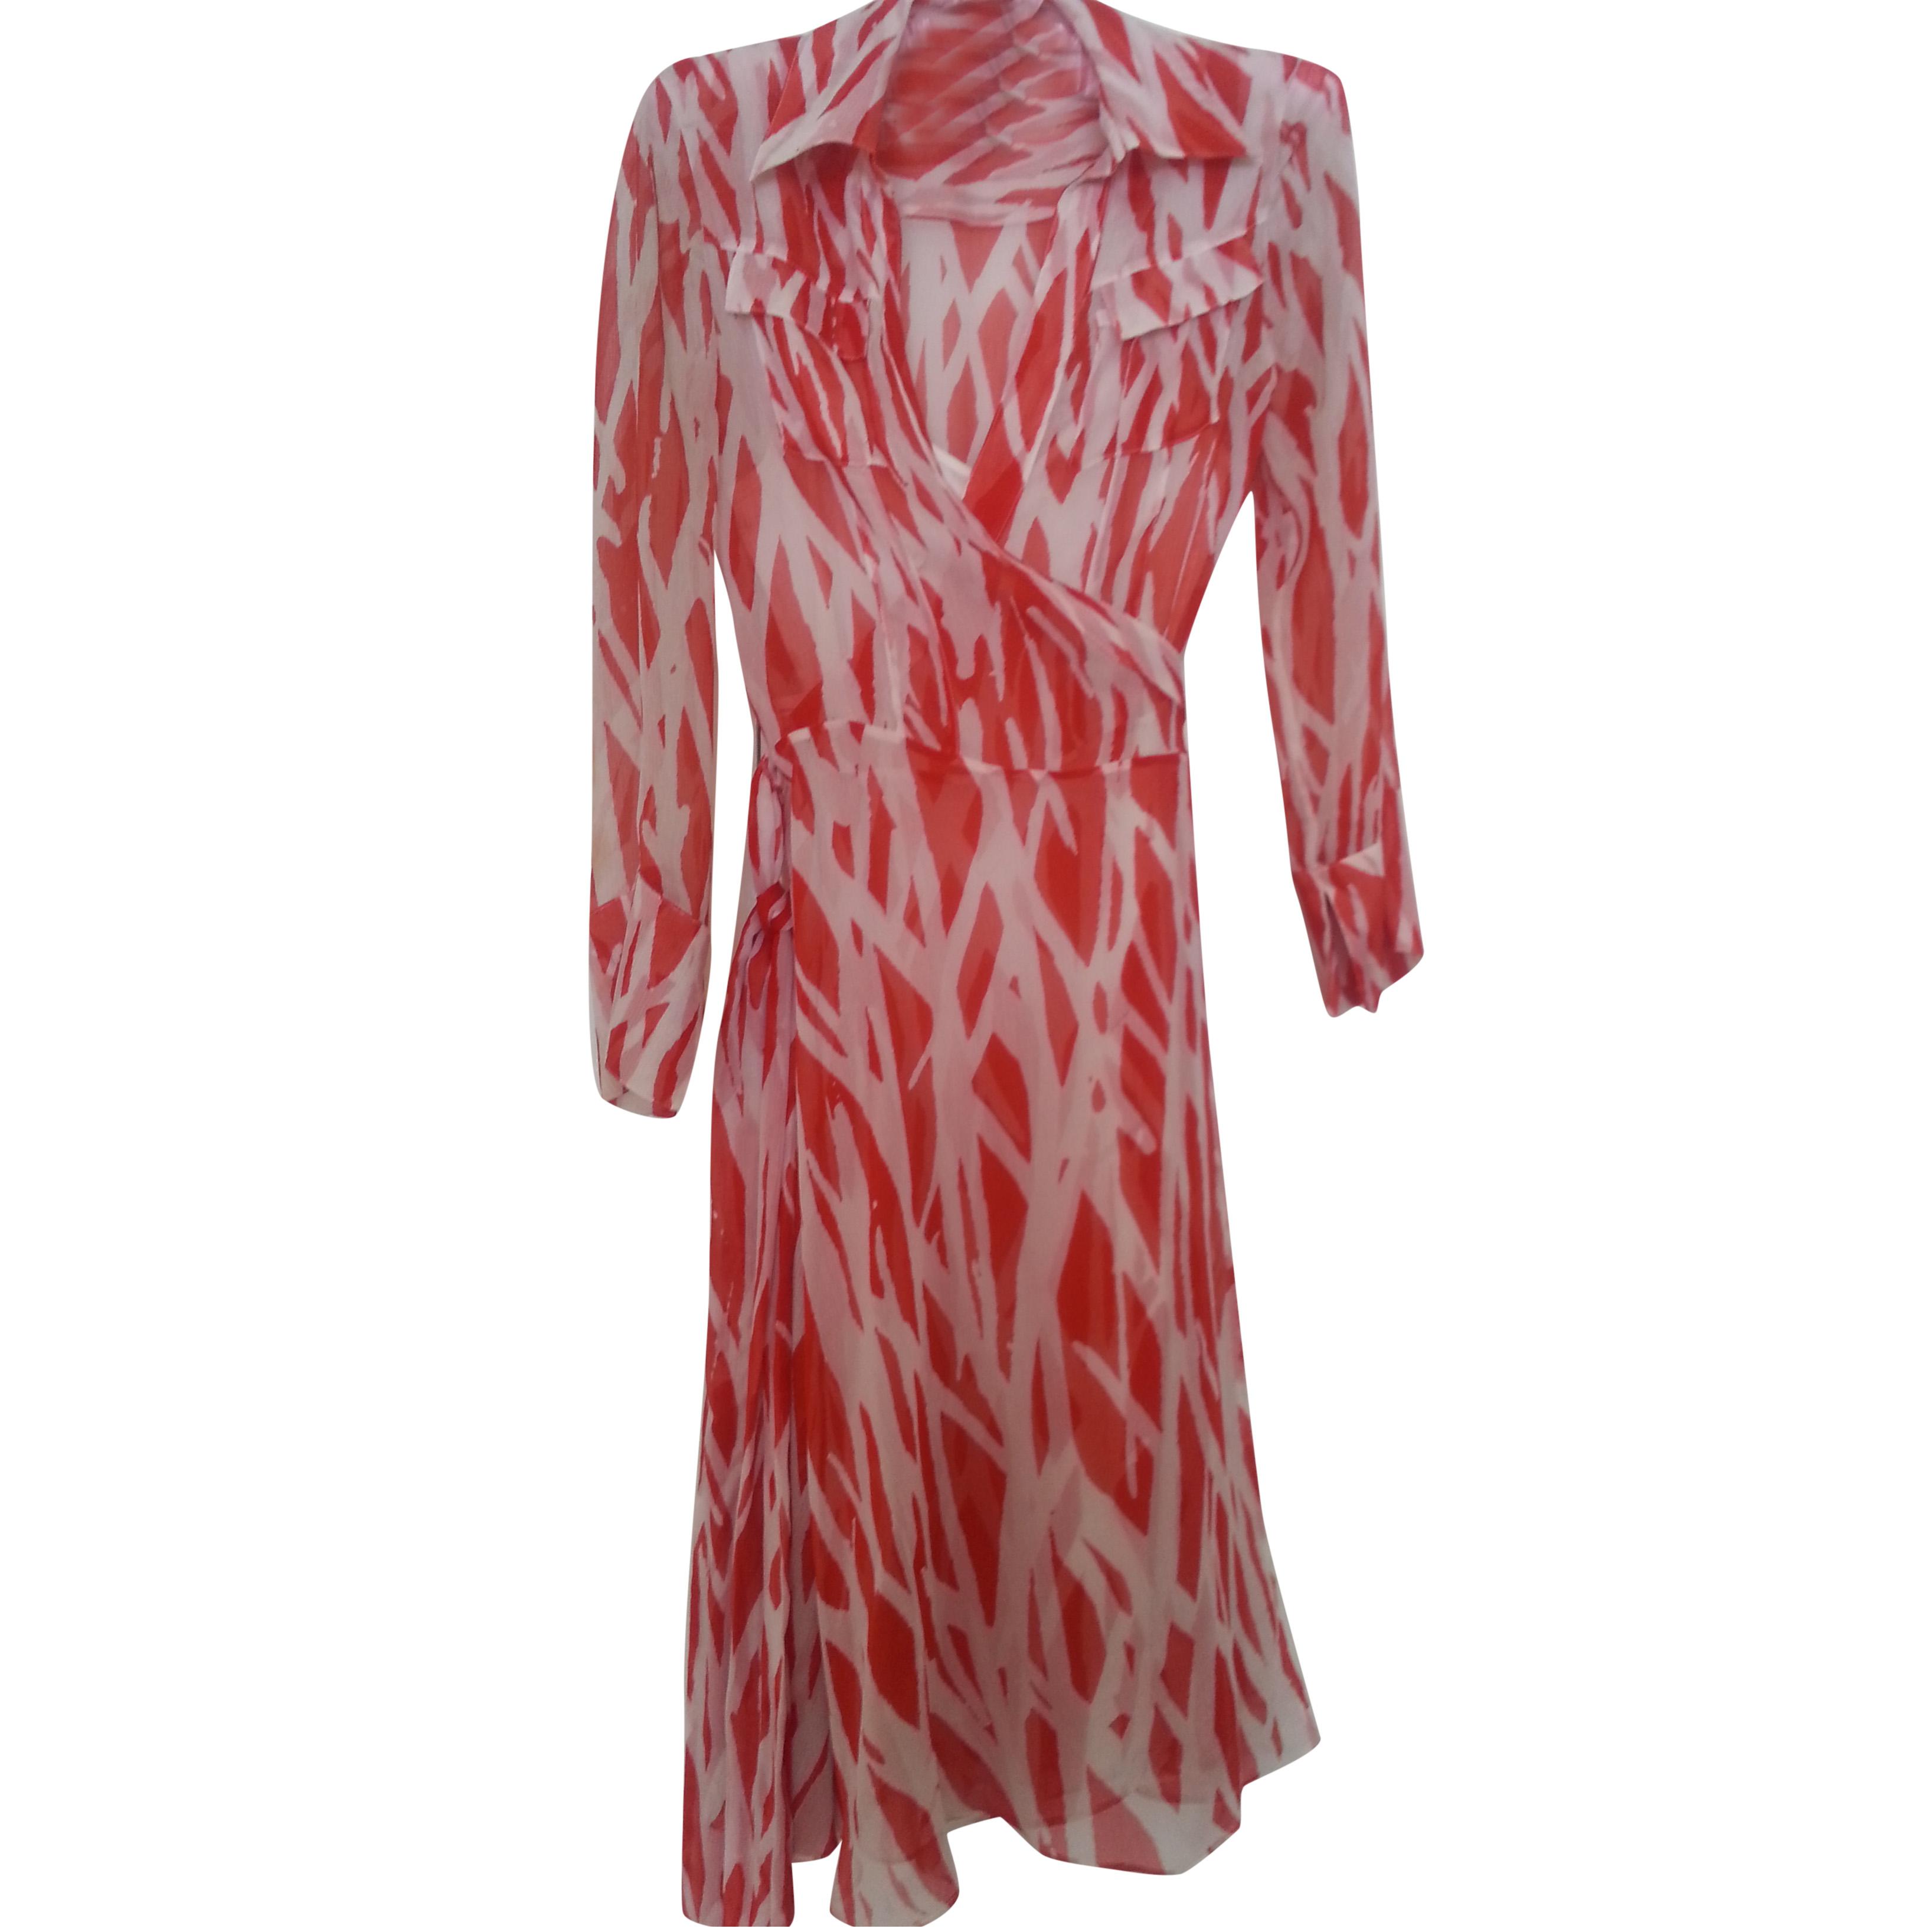 DVF Silk chiffon red/white wrap shirt dress